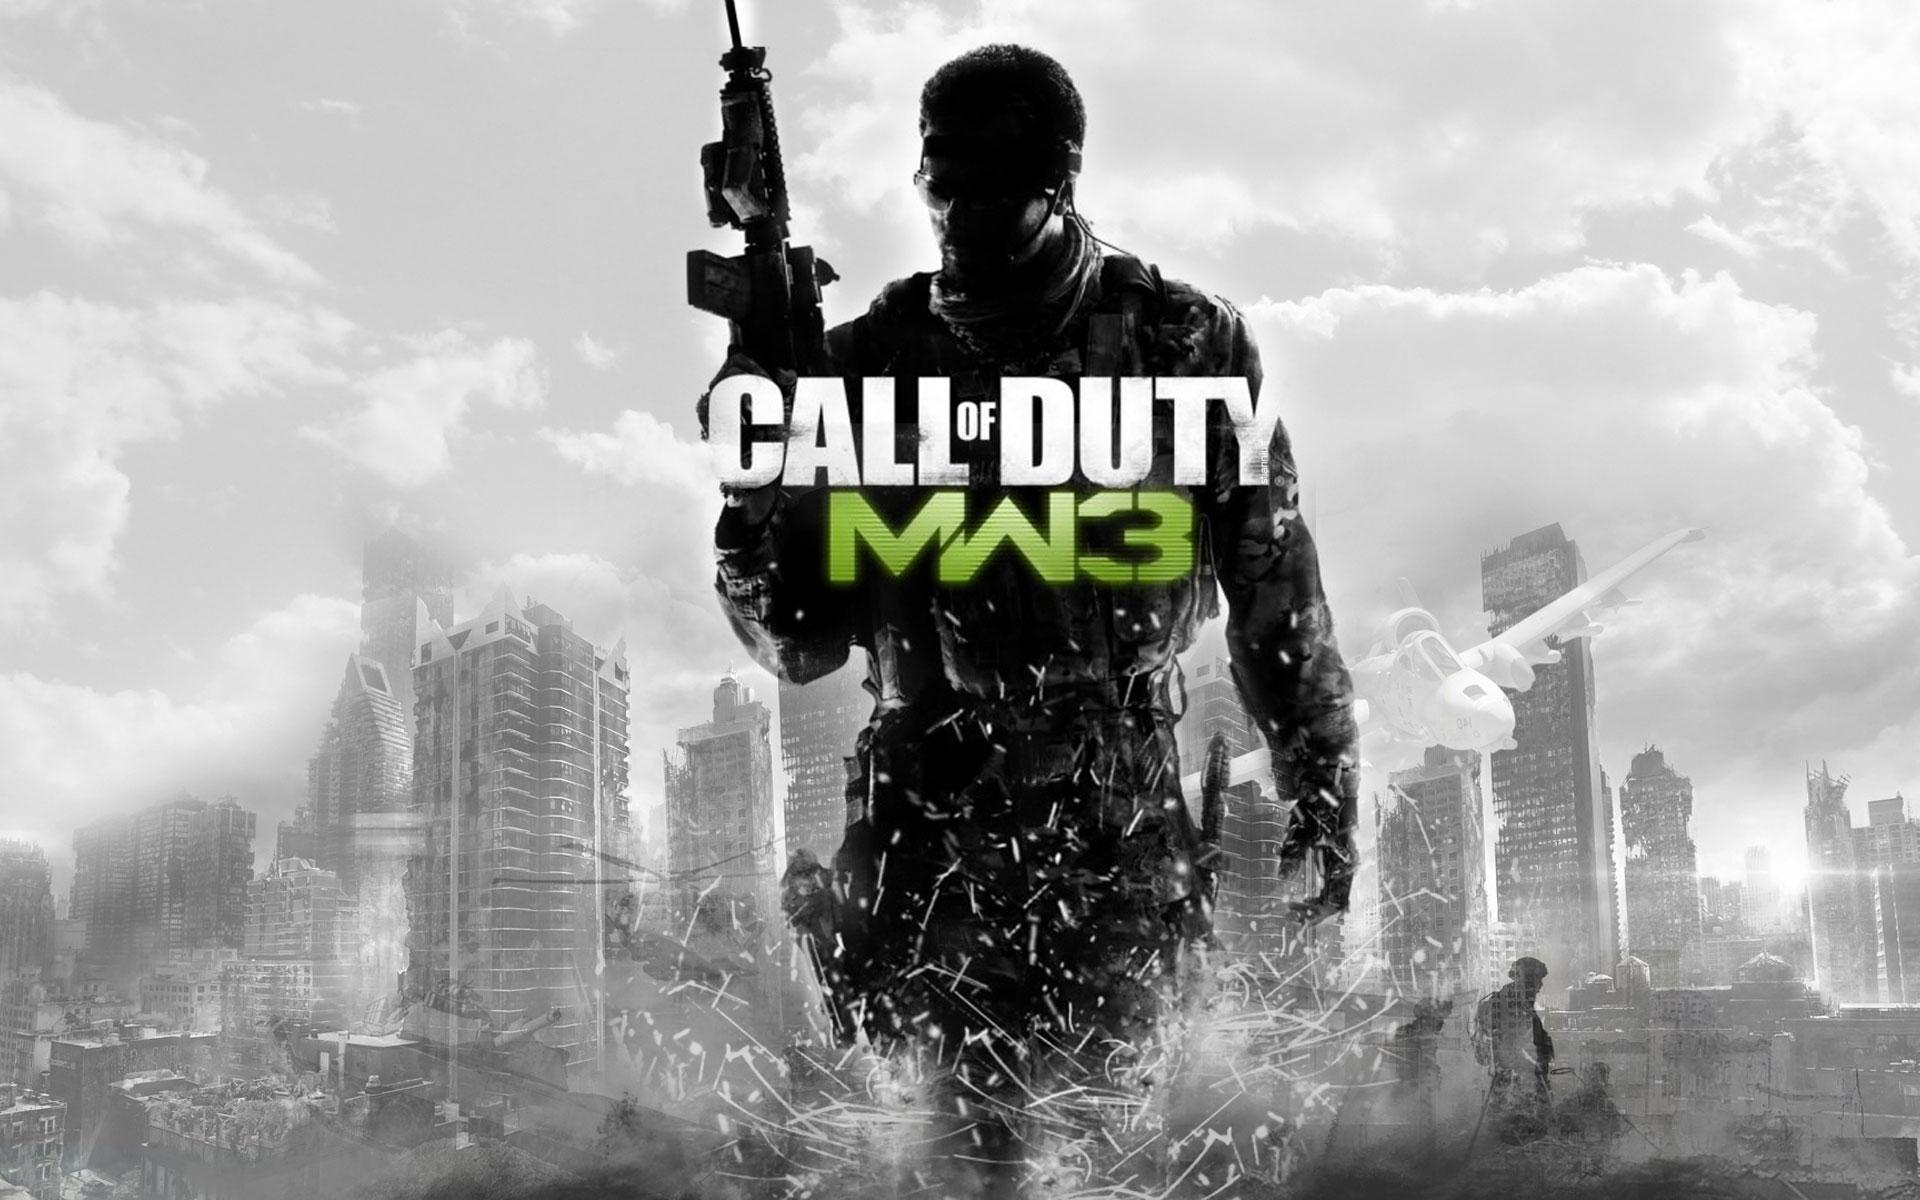 call_of_duty_modern_warfare_3_wallpaper